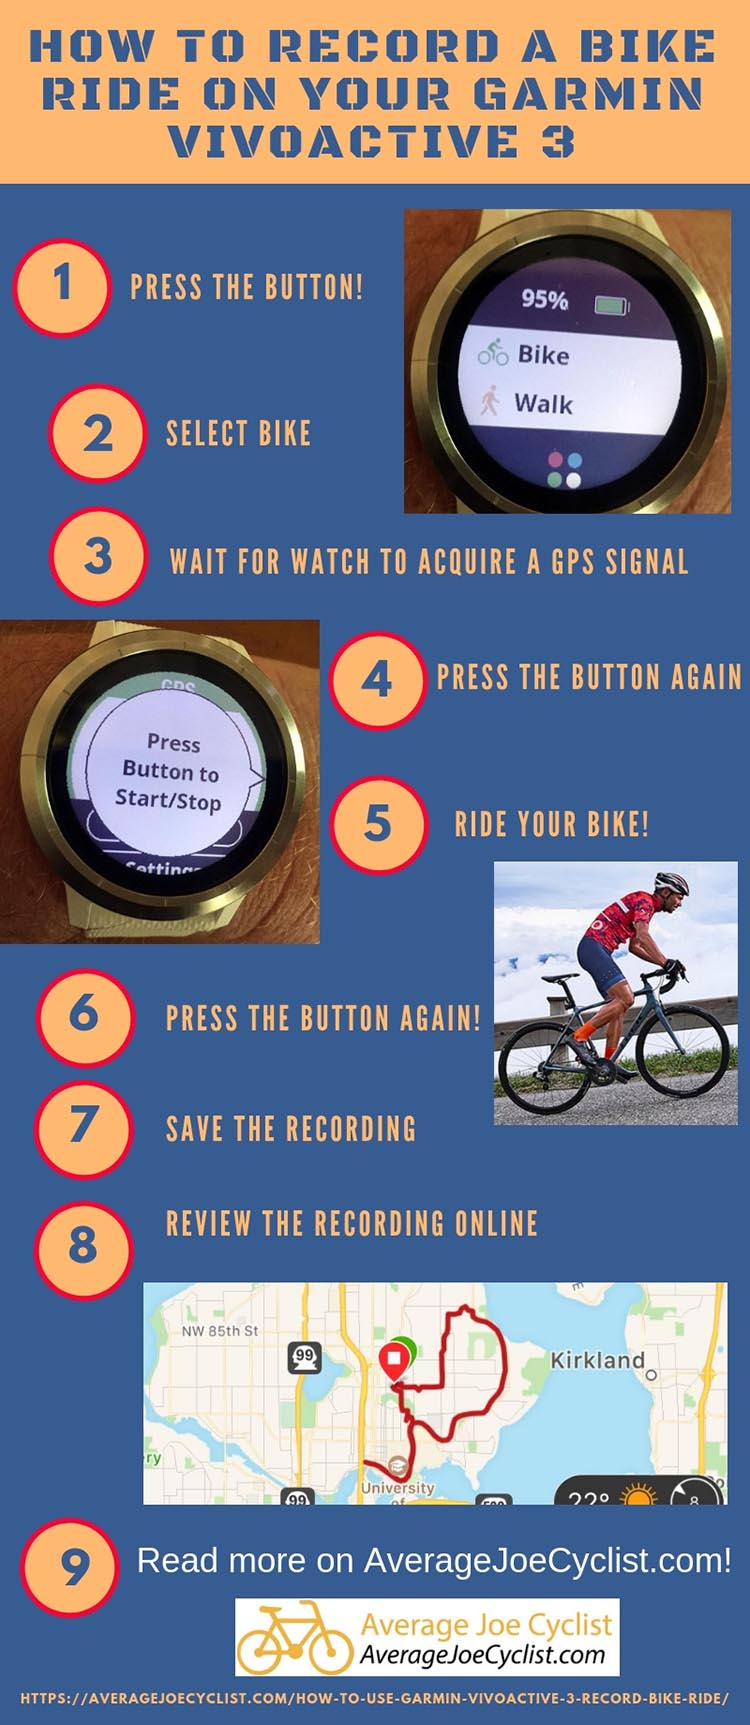 How to record a bike ride with a Garmin Vivoactive 3